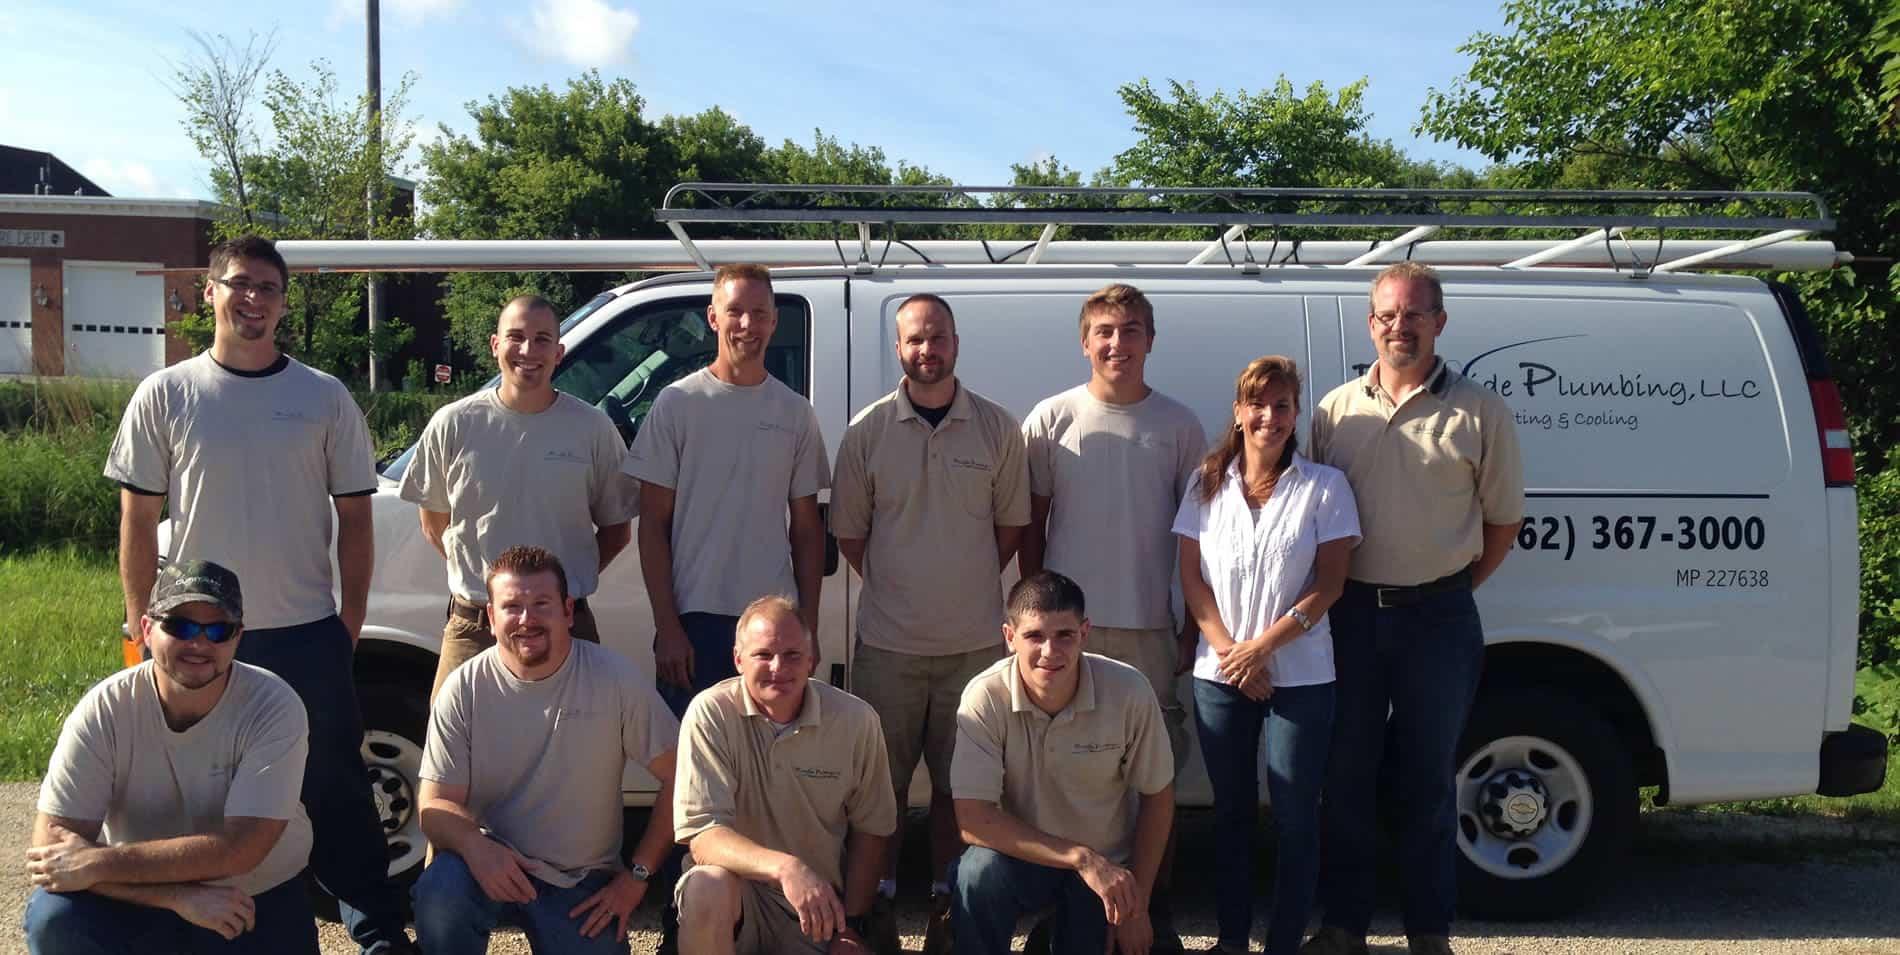 Riverside Plumbing LLC Team in Nashotah, WI - Lake Country Area Plumbing & Heating and Cooling Services